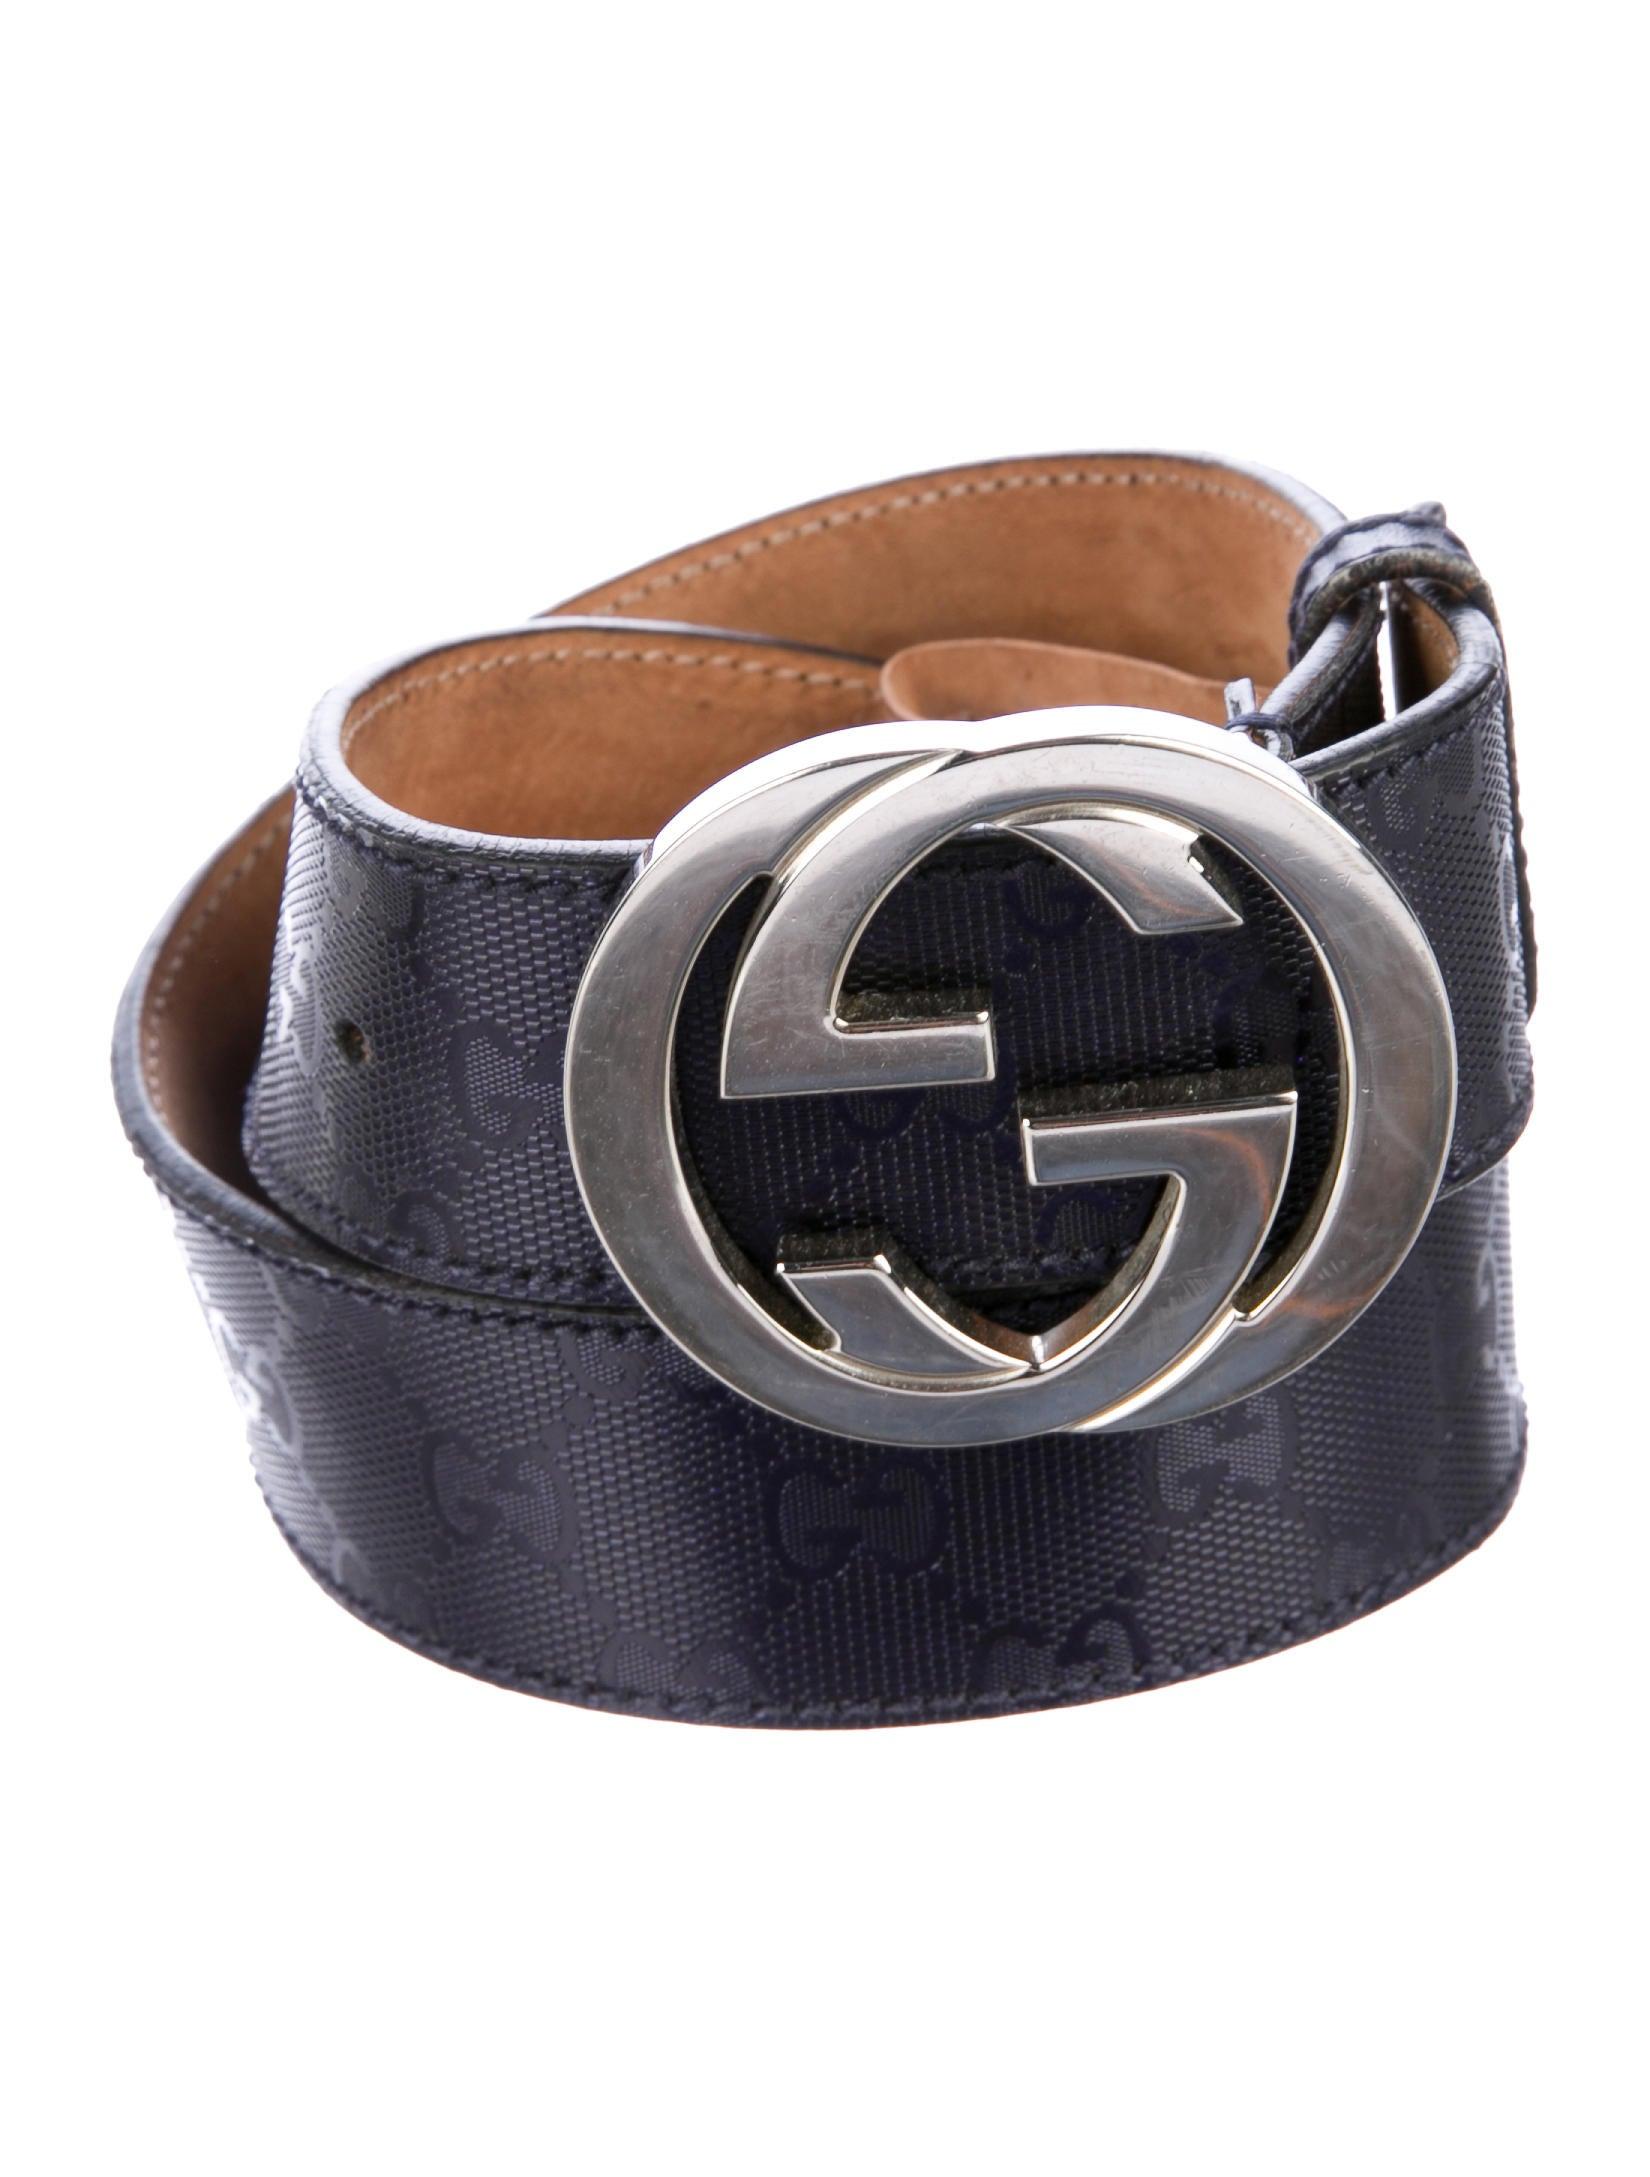 660dd8c26dd Gucci GG Imprimé Belt - Accessories - GUC223205